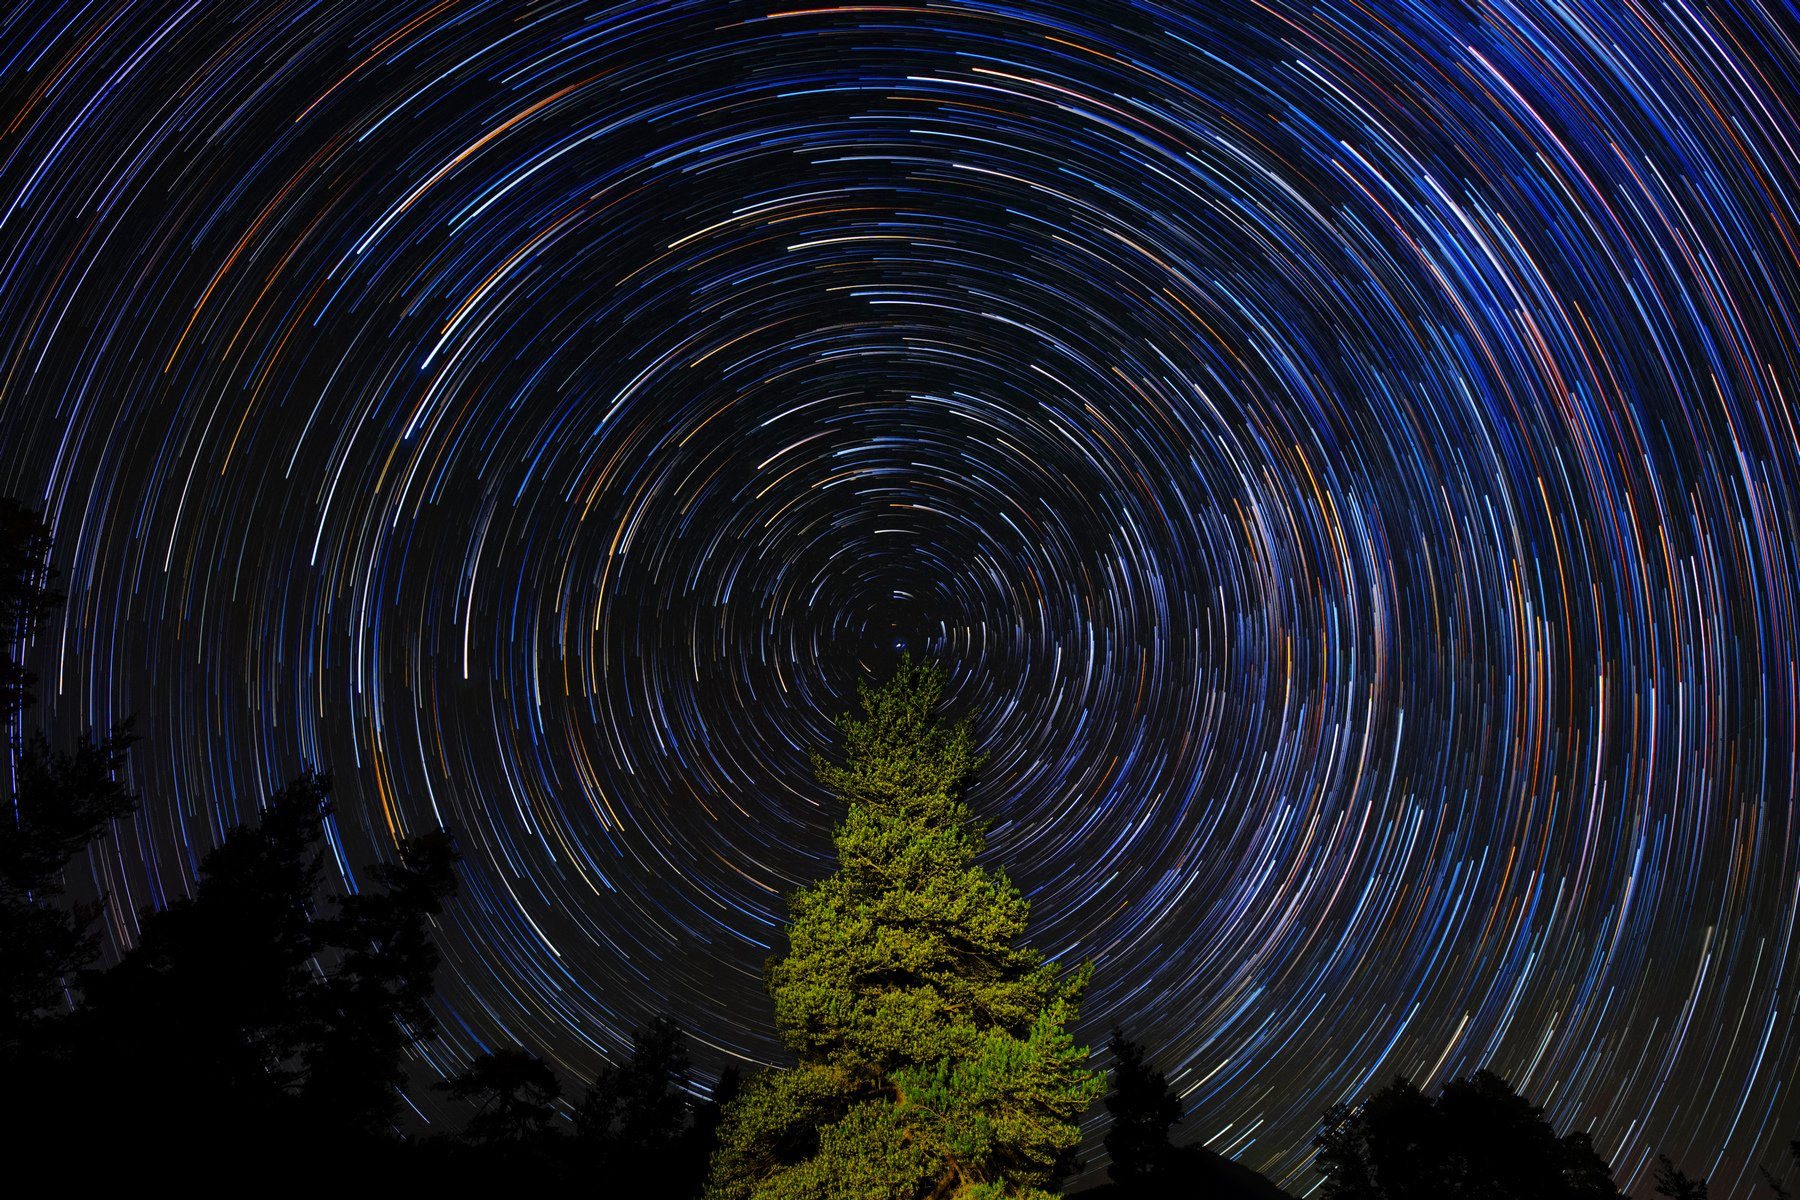 night, astrophotography, star trails, Иван Курмышов